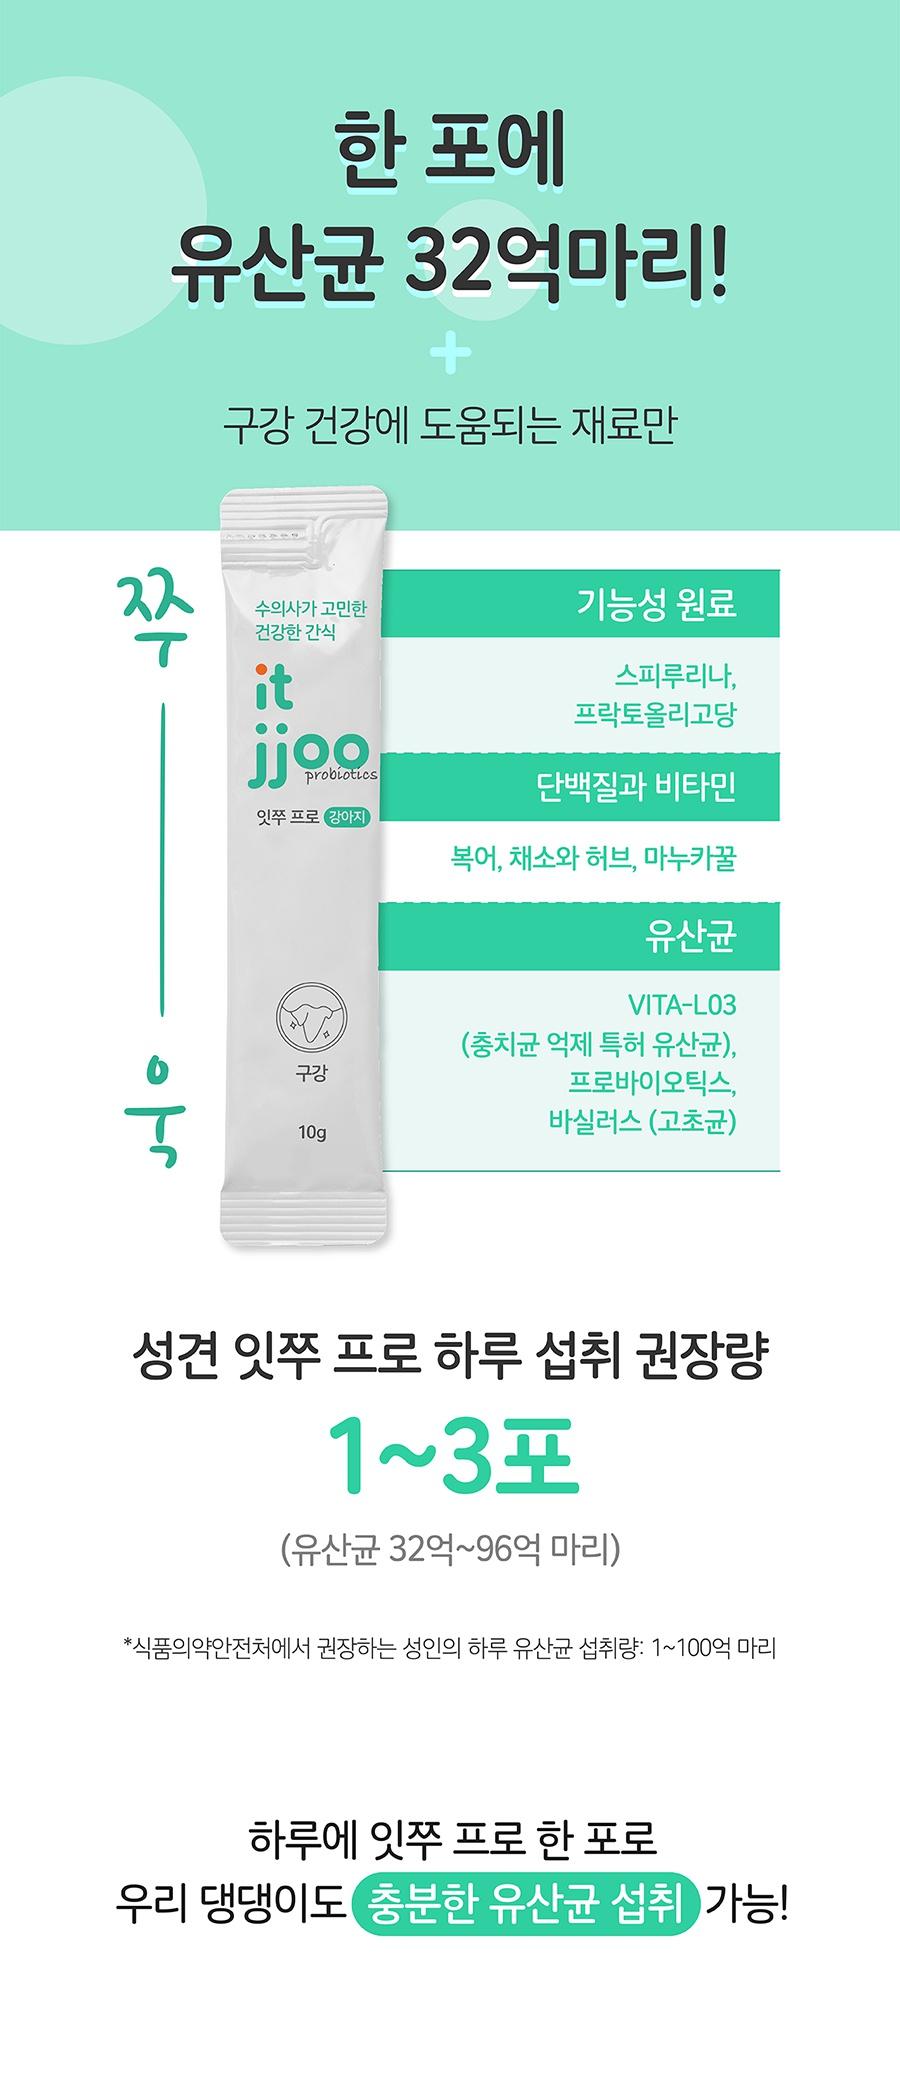 it 잇쭈 프로 도그 구강 대용량 (8개입*4개)-상품이미지-3